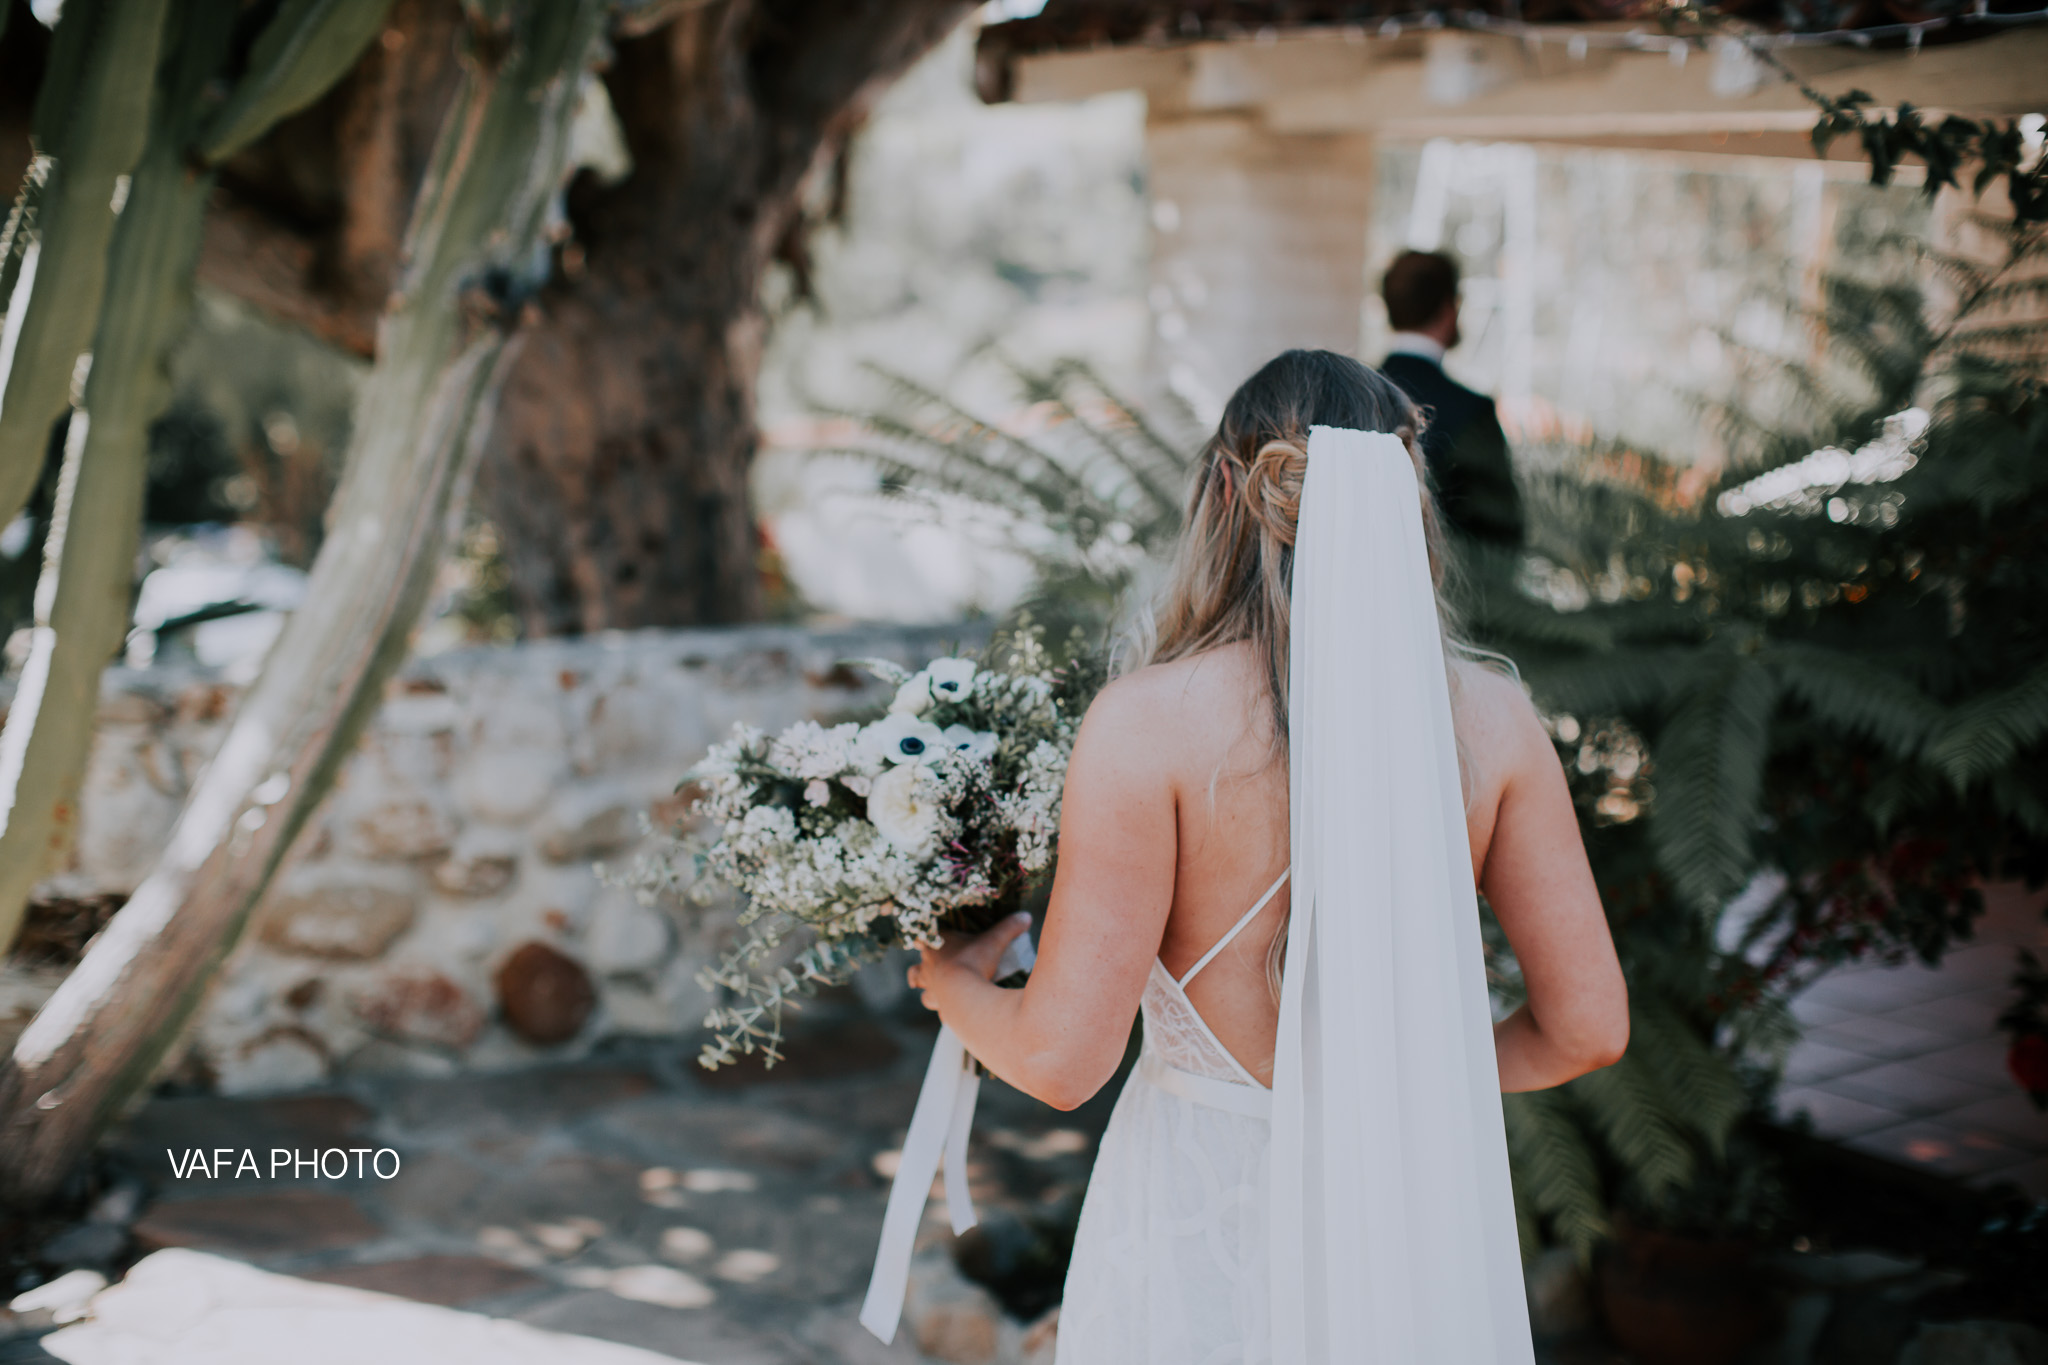 Leo-Carrillo-Ranch-Wedding-Lauren-Mike-Vafa-Photo-229.jpg